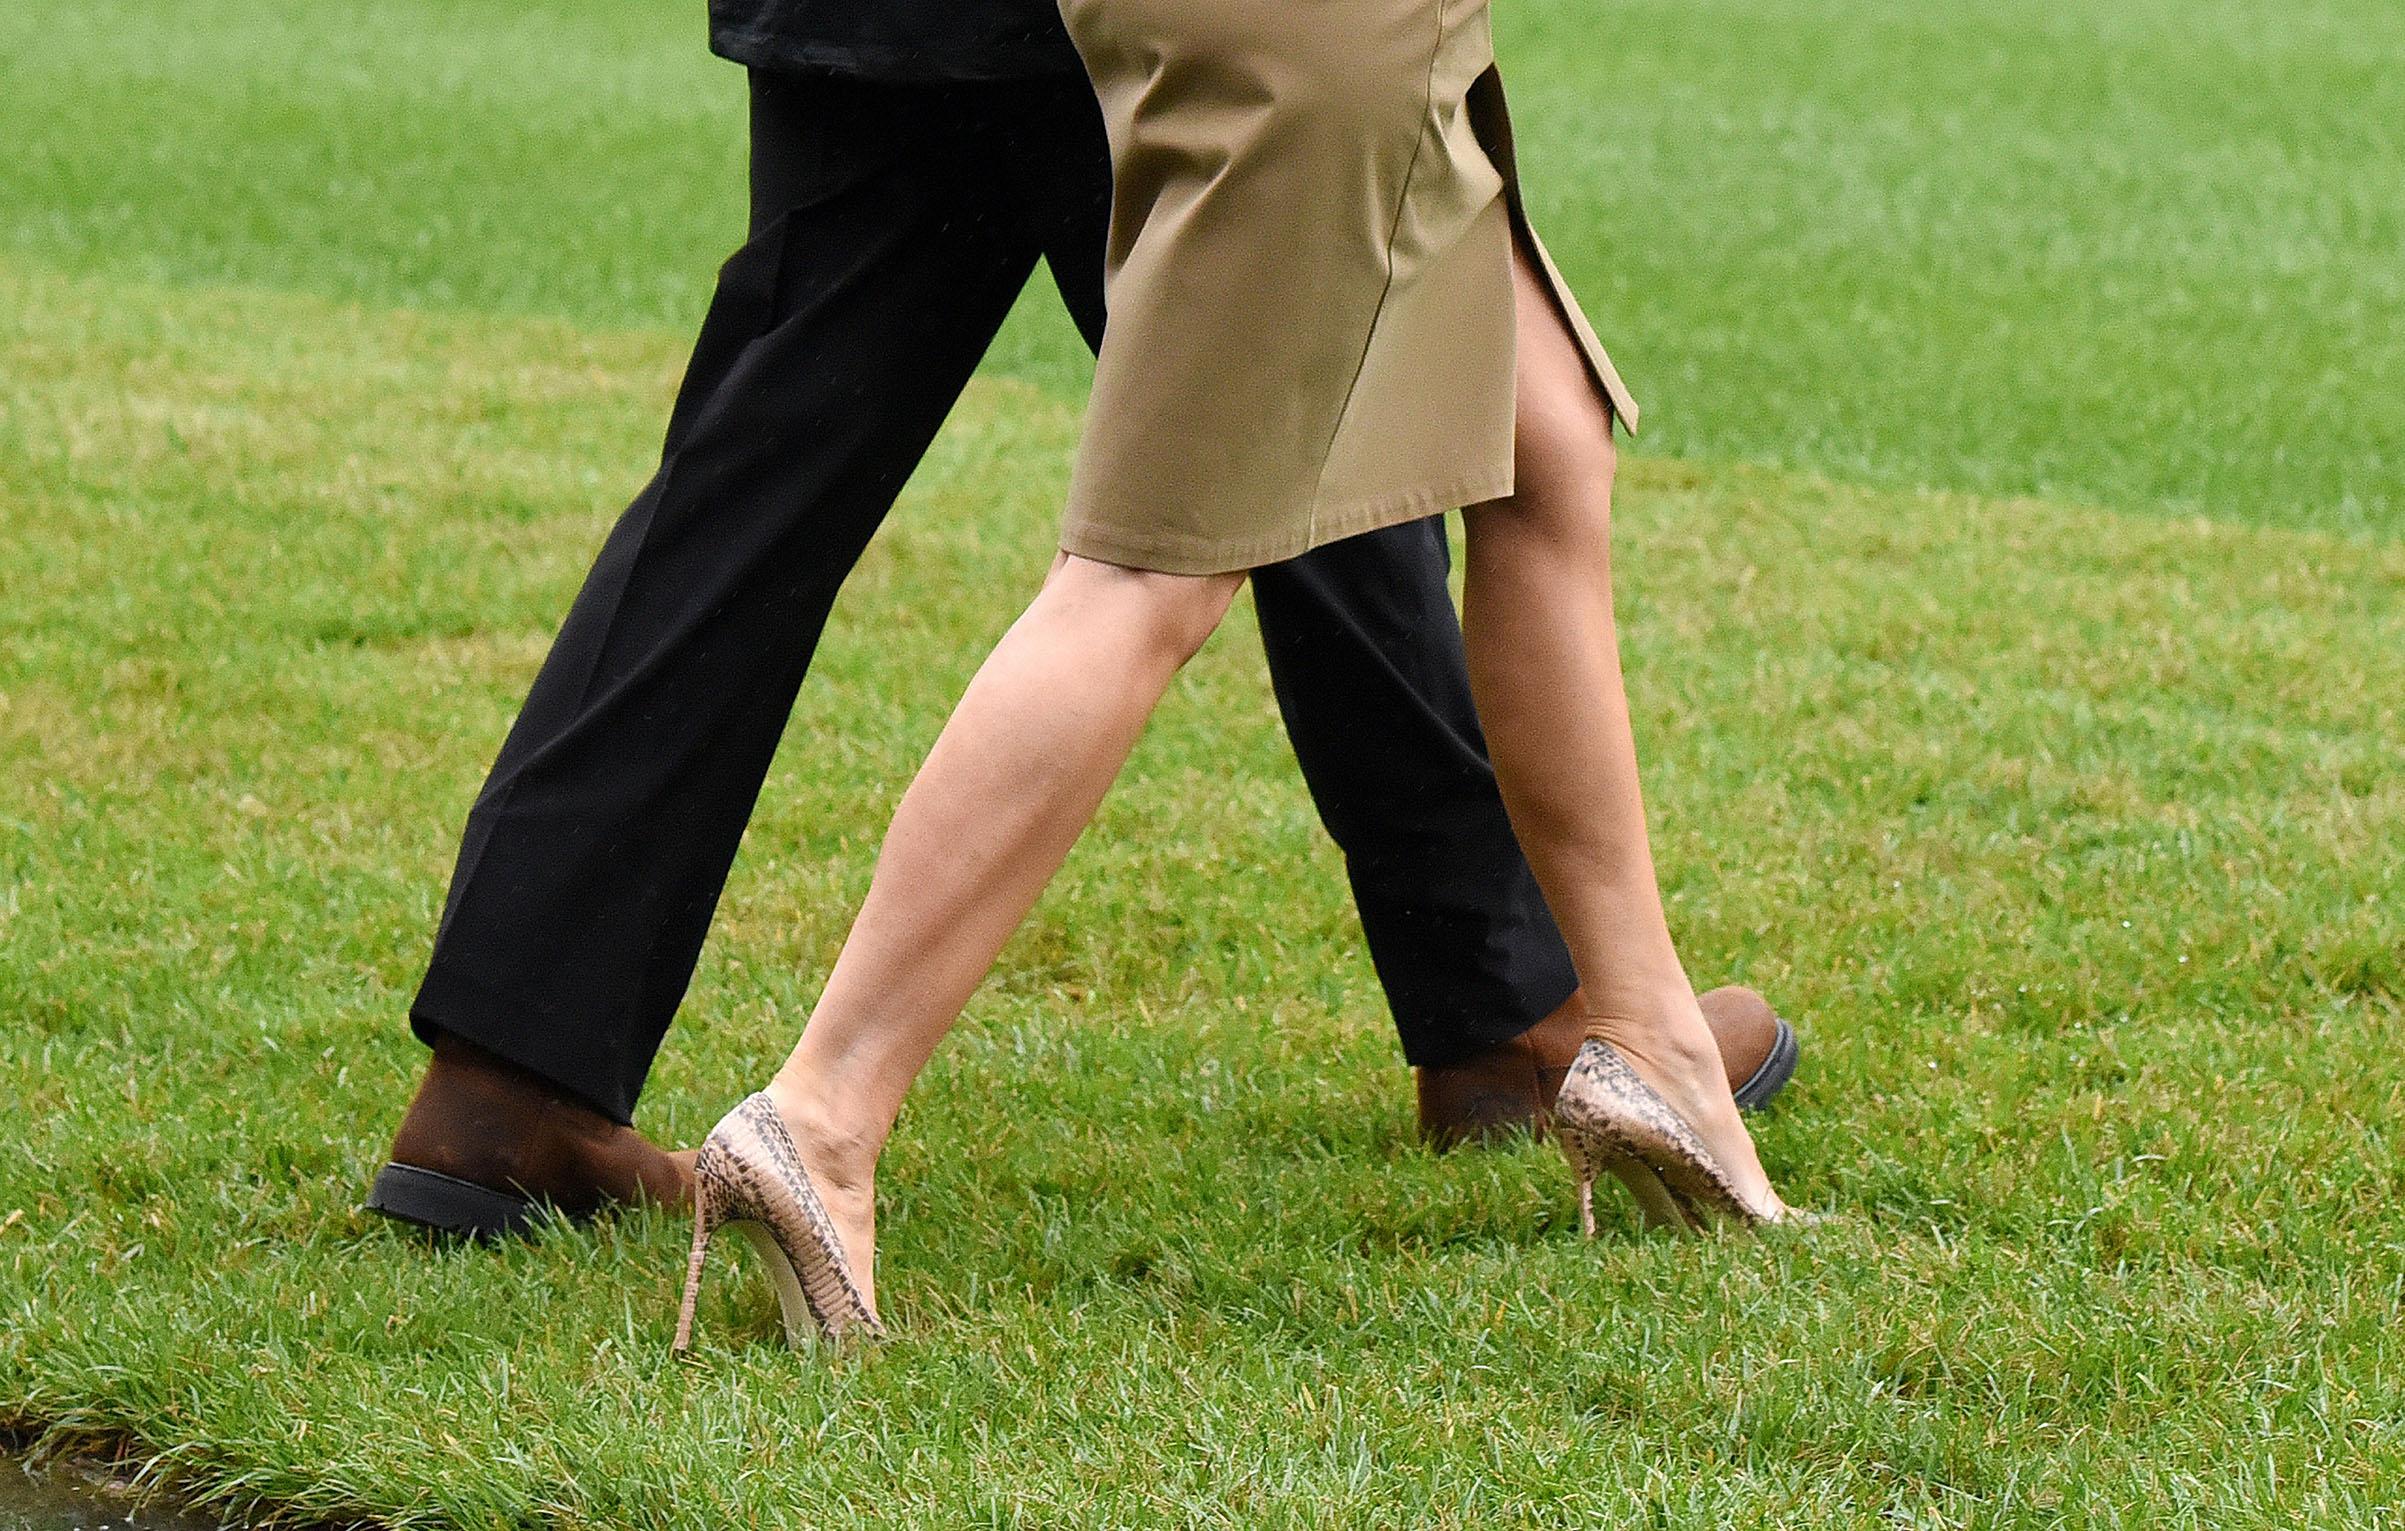 President Donald Trump walks with first lady Melania Trump wearing Manolo Blahnik snakeskin stilettos , prior to their departure to Hurricane Harvey Sept. 2, 2017 in Washington, DC.